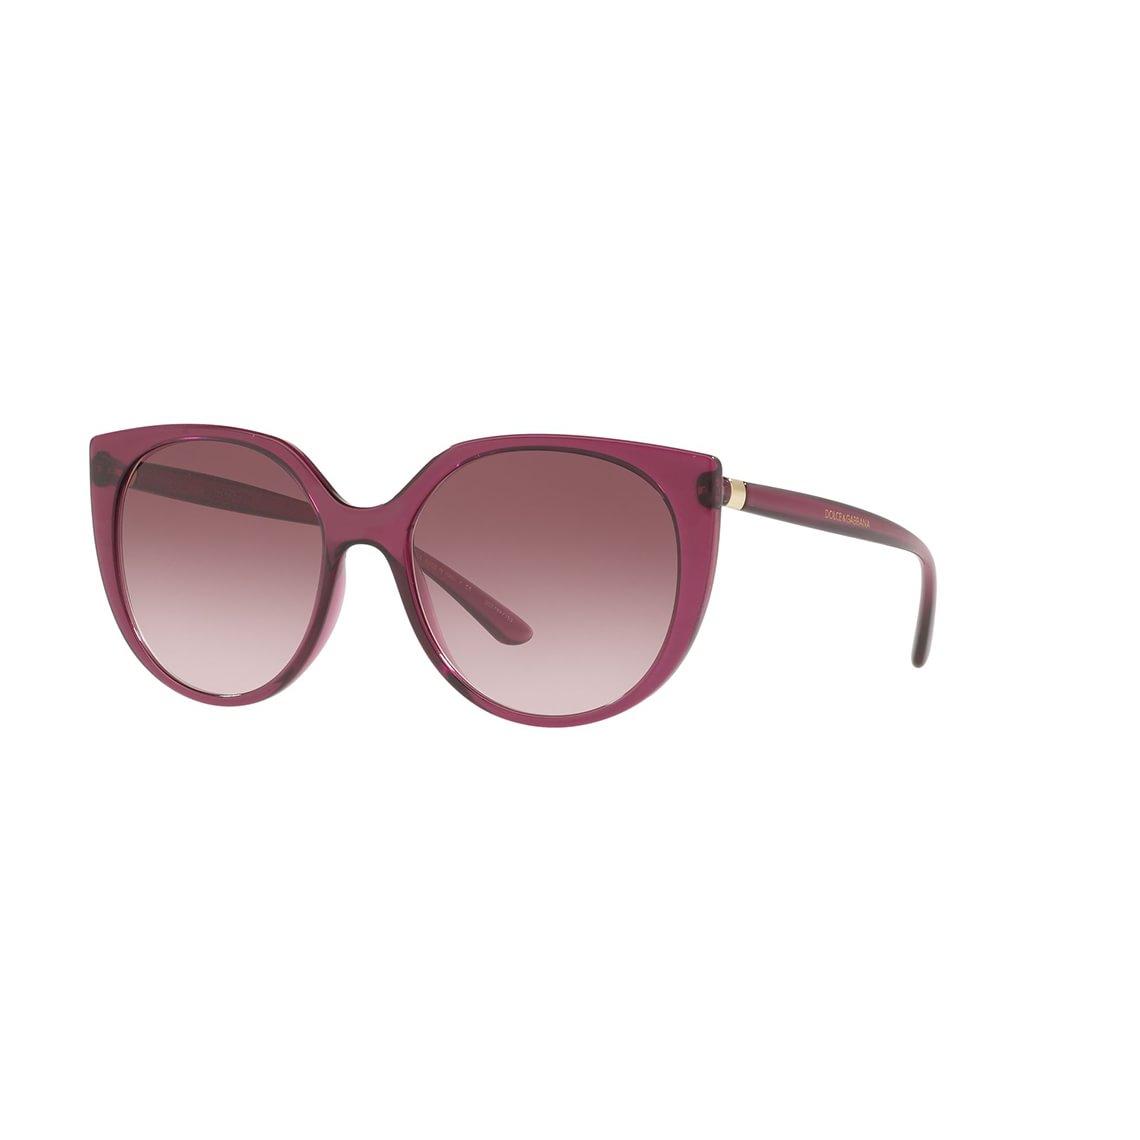 Dolce & Gabbana 0DG6119 54 17548H